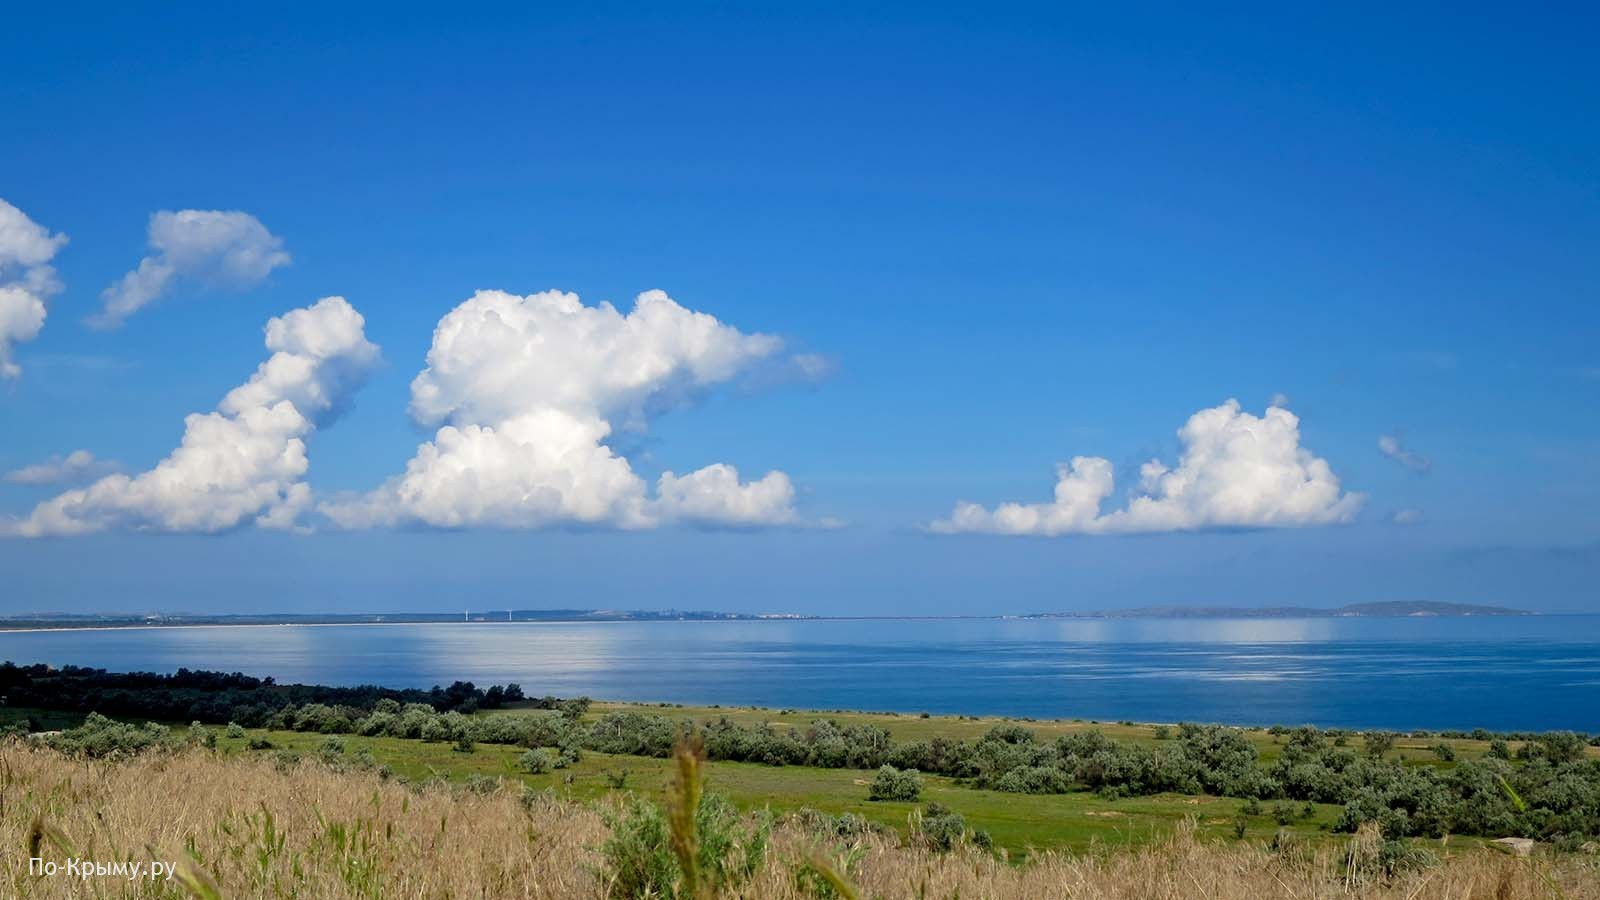 Казантипский залив Азовского моря